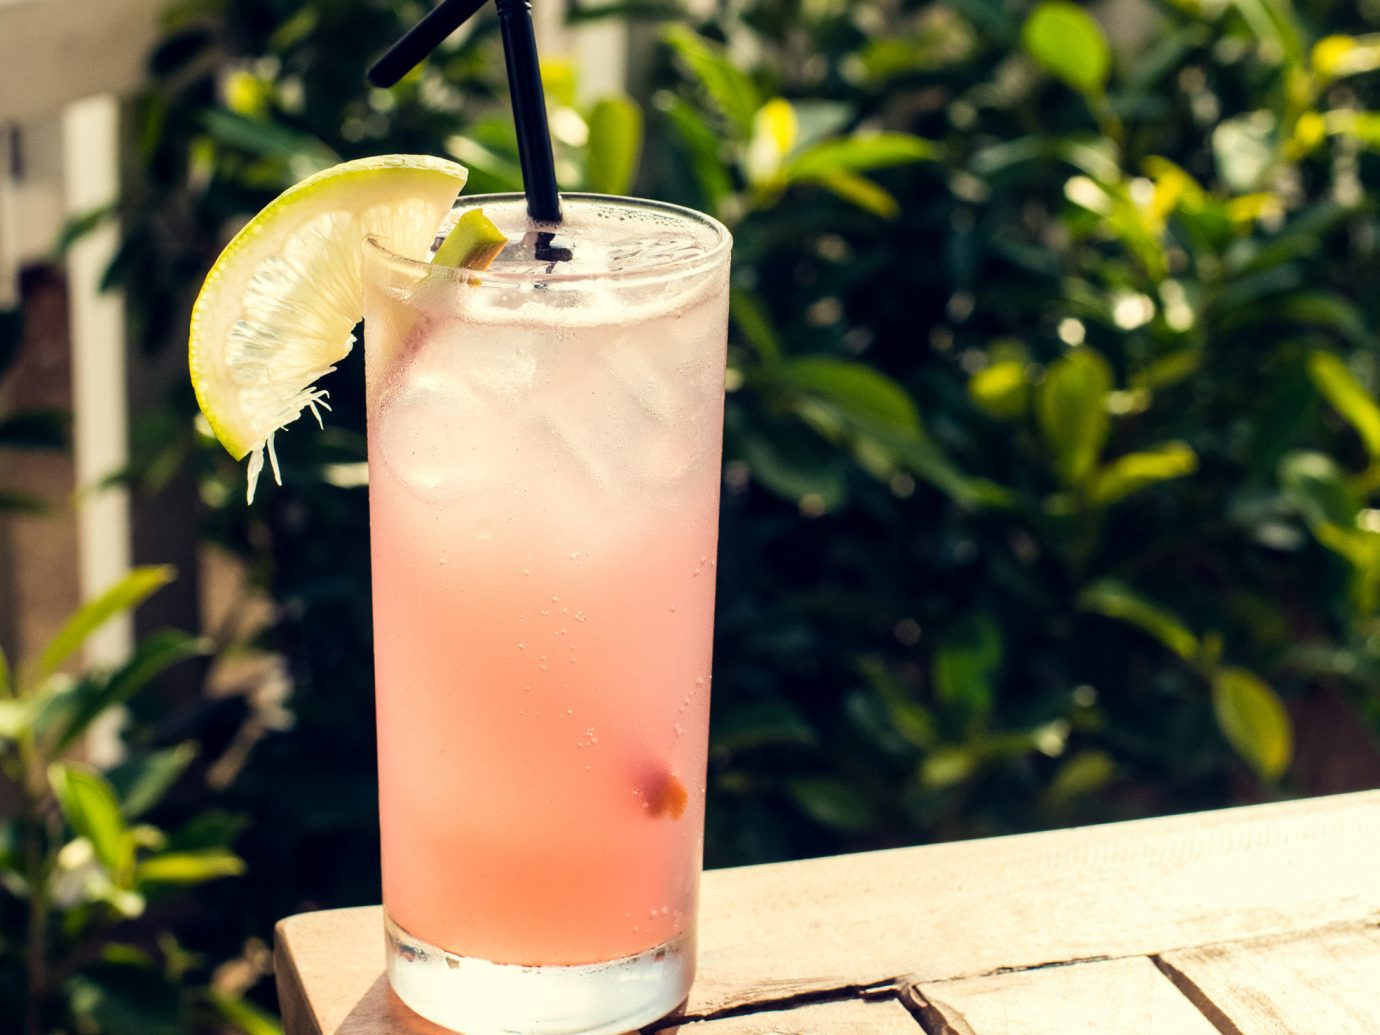 Drink outdoor food beverage non alcoholic beverage bay breeze cocktail garnish cocktail mai tai juice singapore sling lemonade sex on the beach batida limeade fruit drink